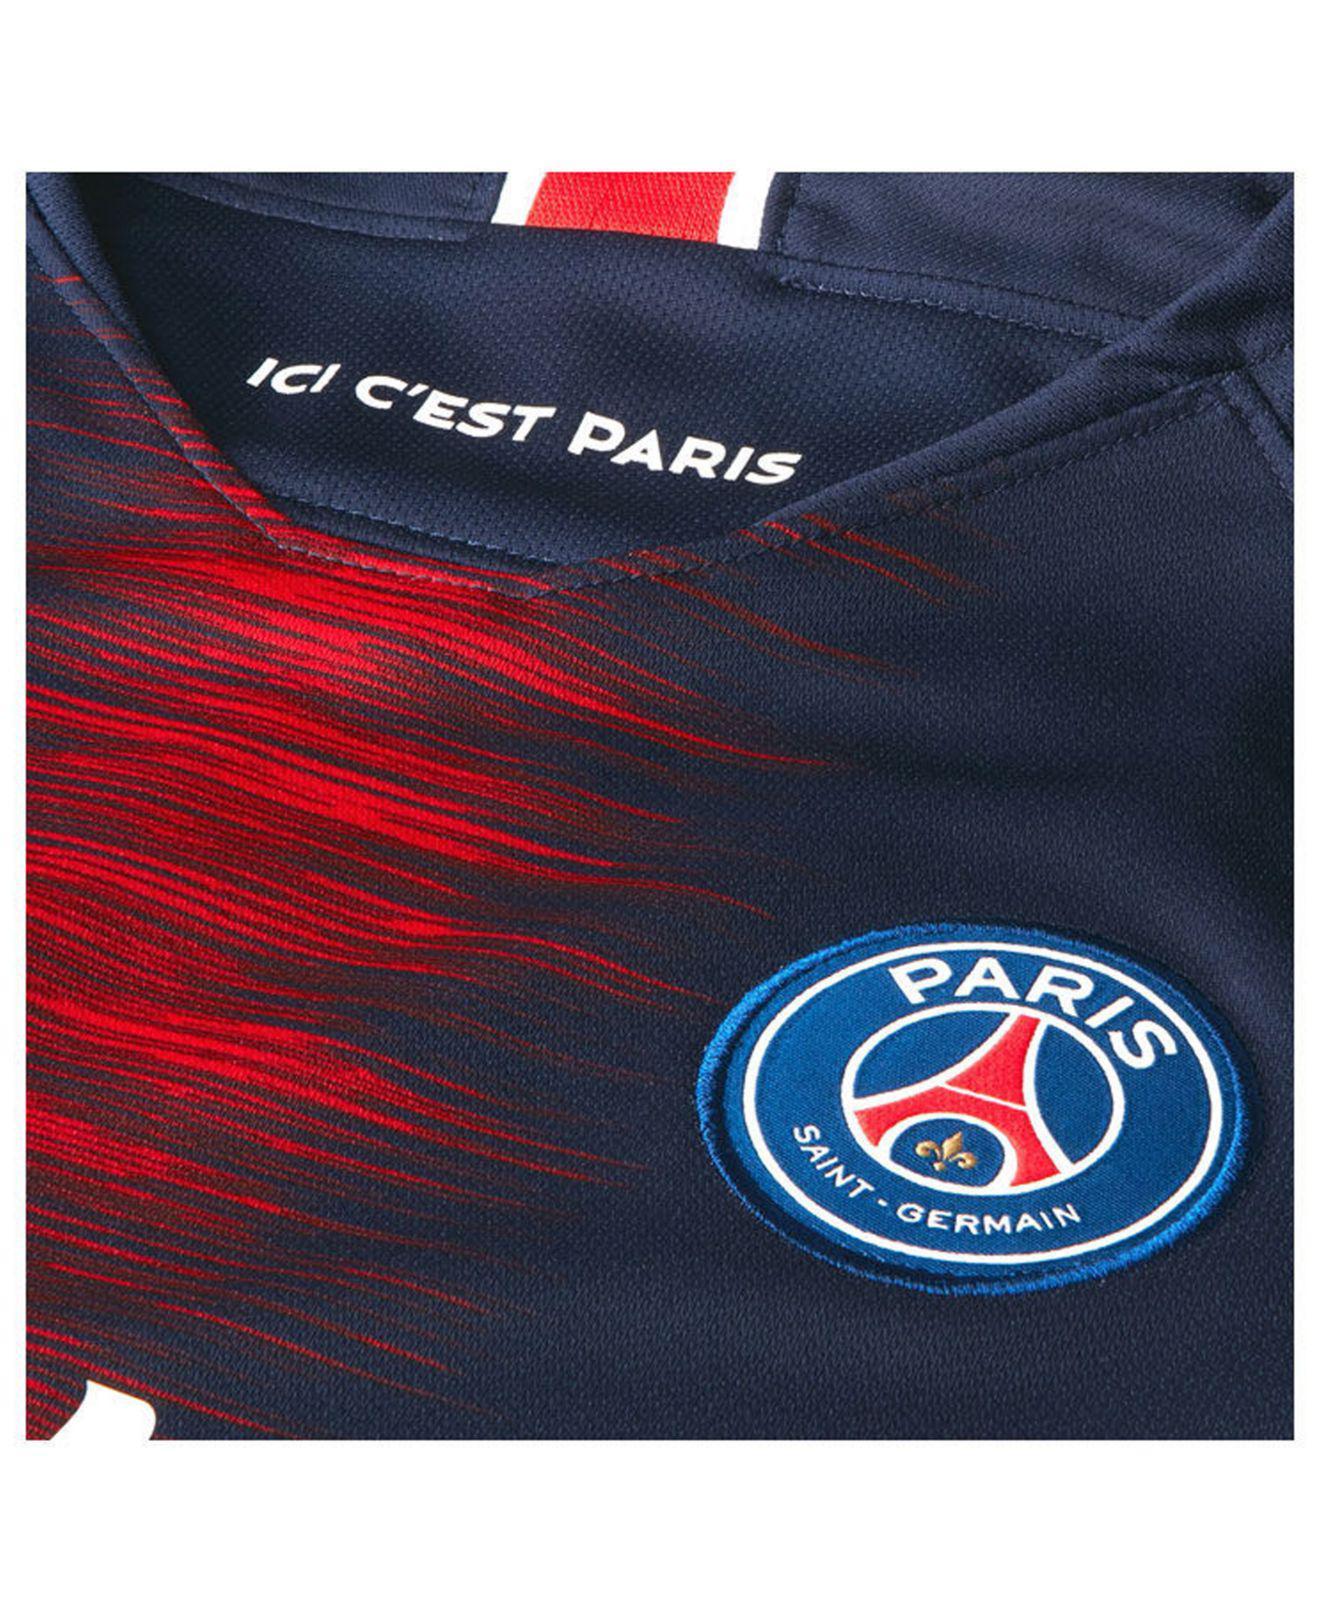 6194c44a14ba1 Lyst - Nike 2018 19 Paris Saint-germain Stadium Home Men s Soccer Jersey in  Blue for Men - Save 22%